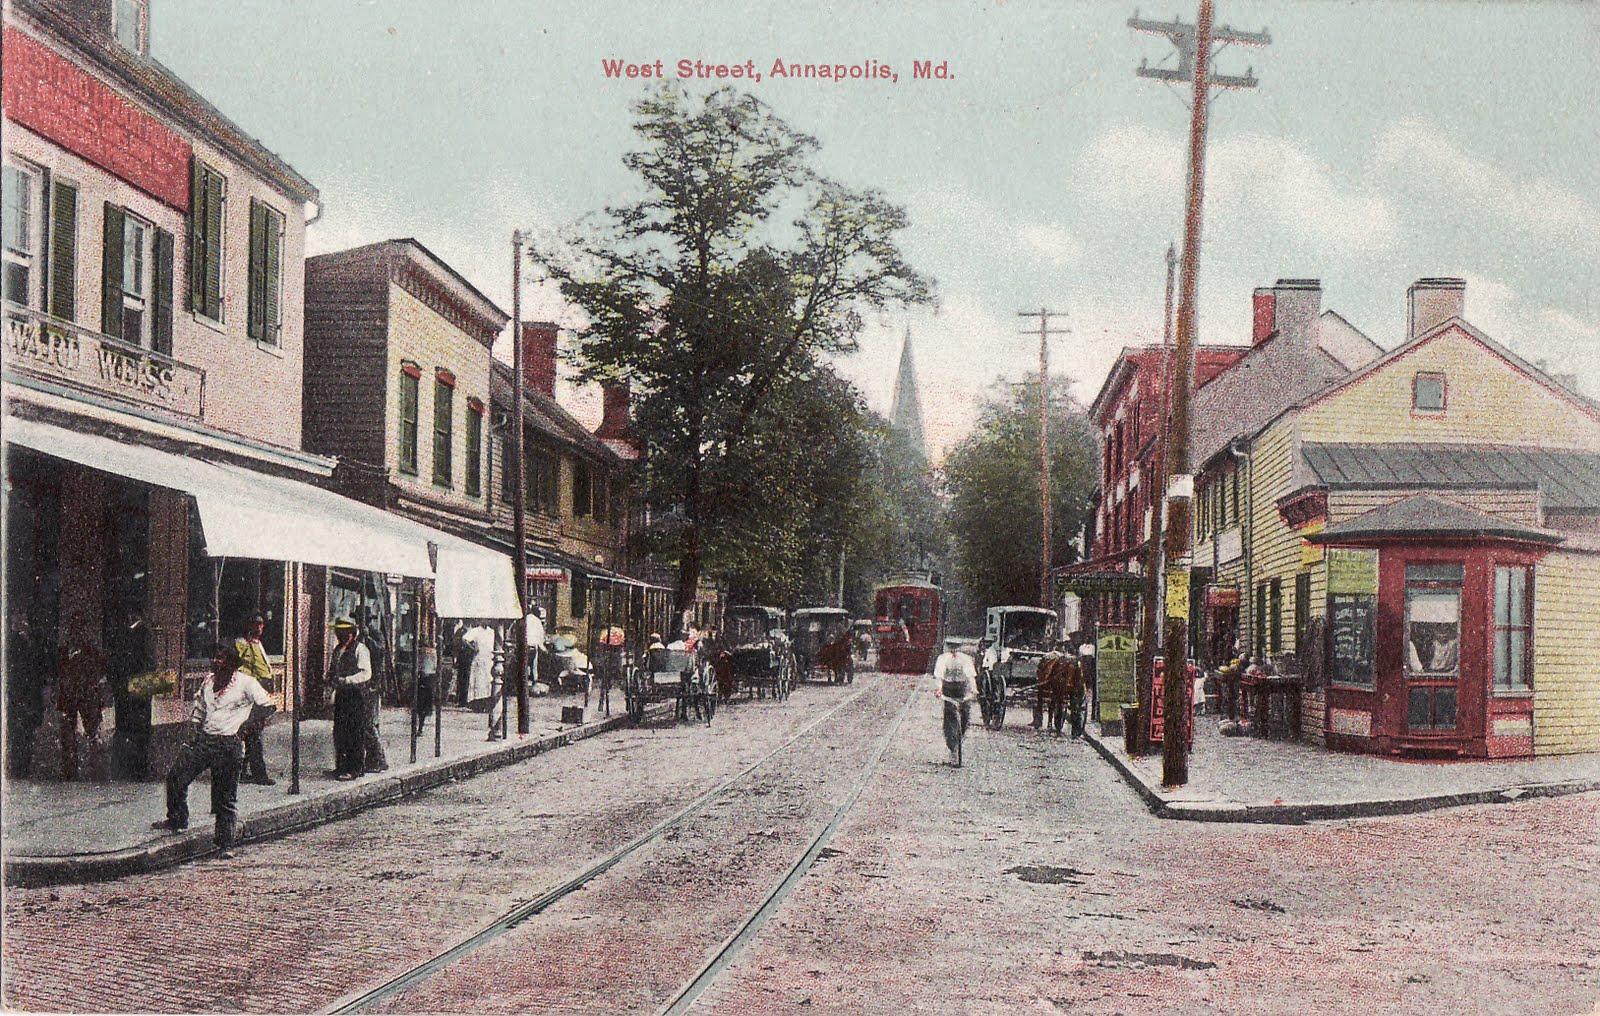 Washington-Baltimore-and-Annapolis-Railroad-Annapolis-Streets-4.jpg